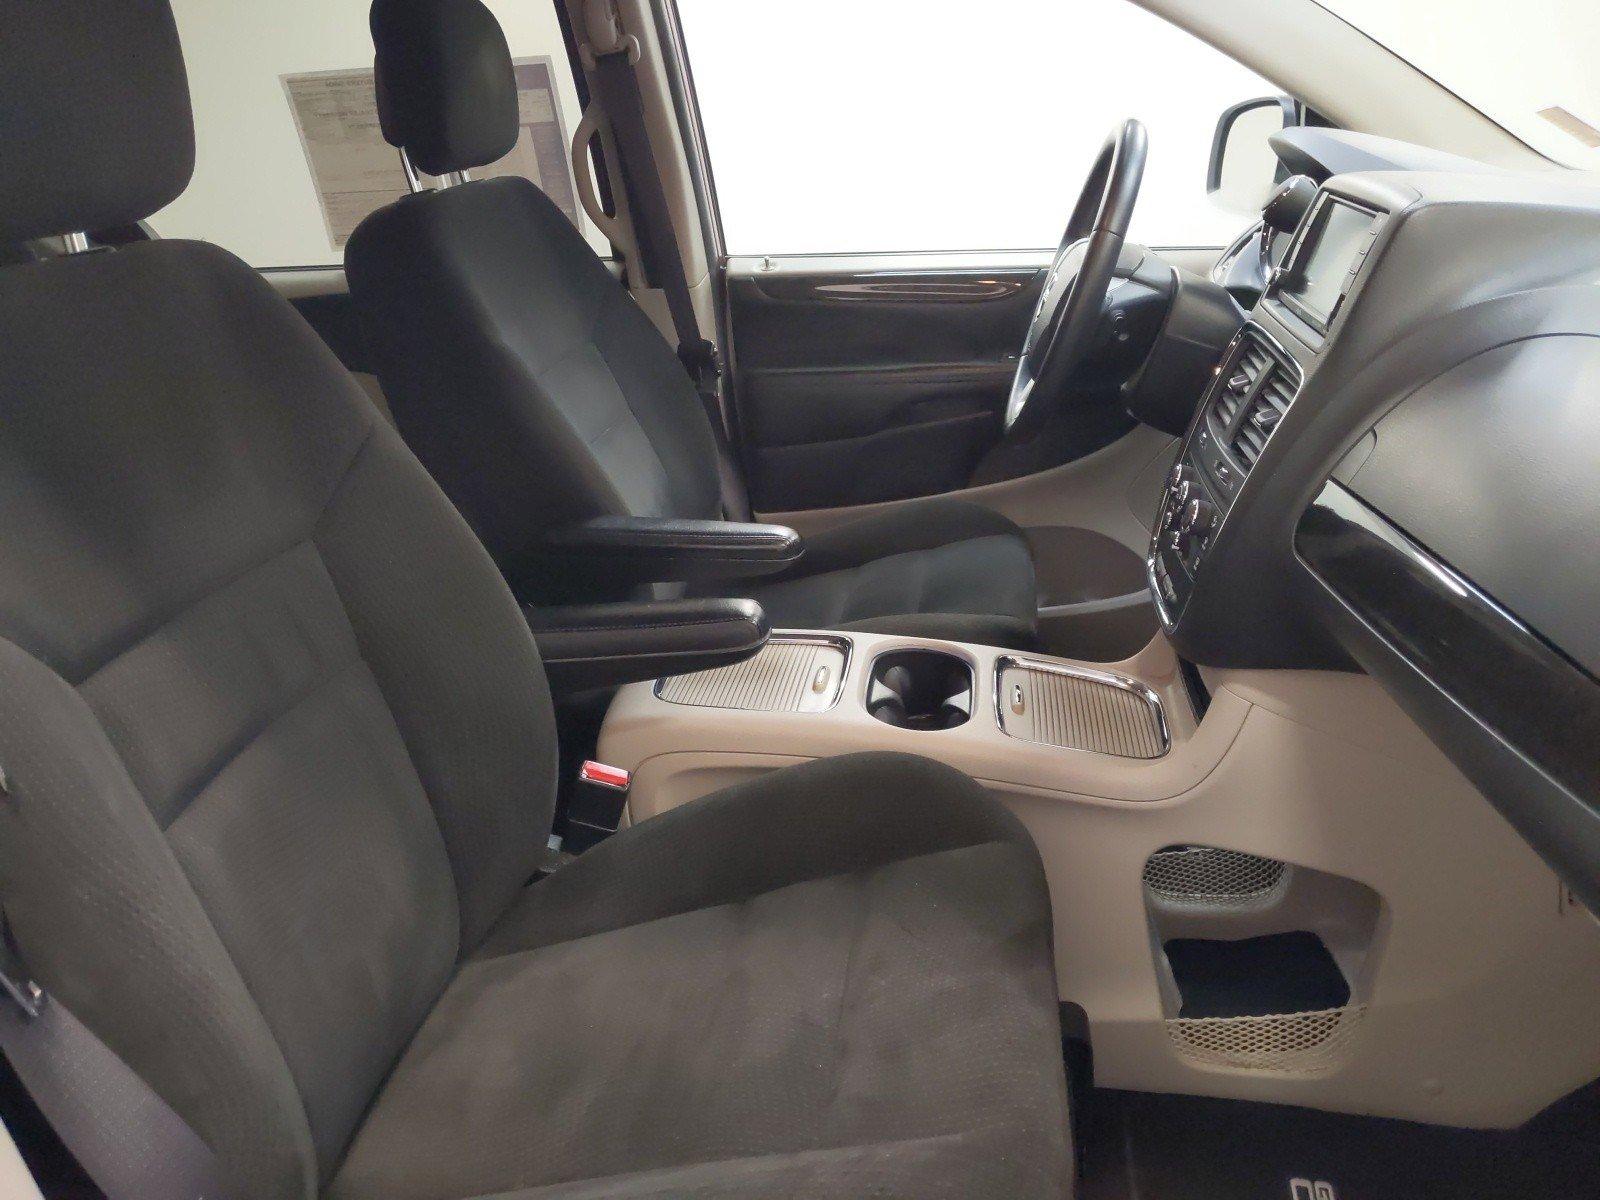 Used 2015 Dodge Grand Caravan SXT Mini-van for sale in Grand Island NE